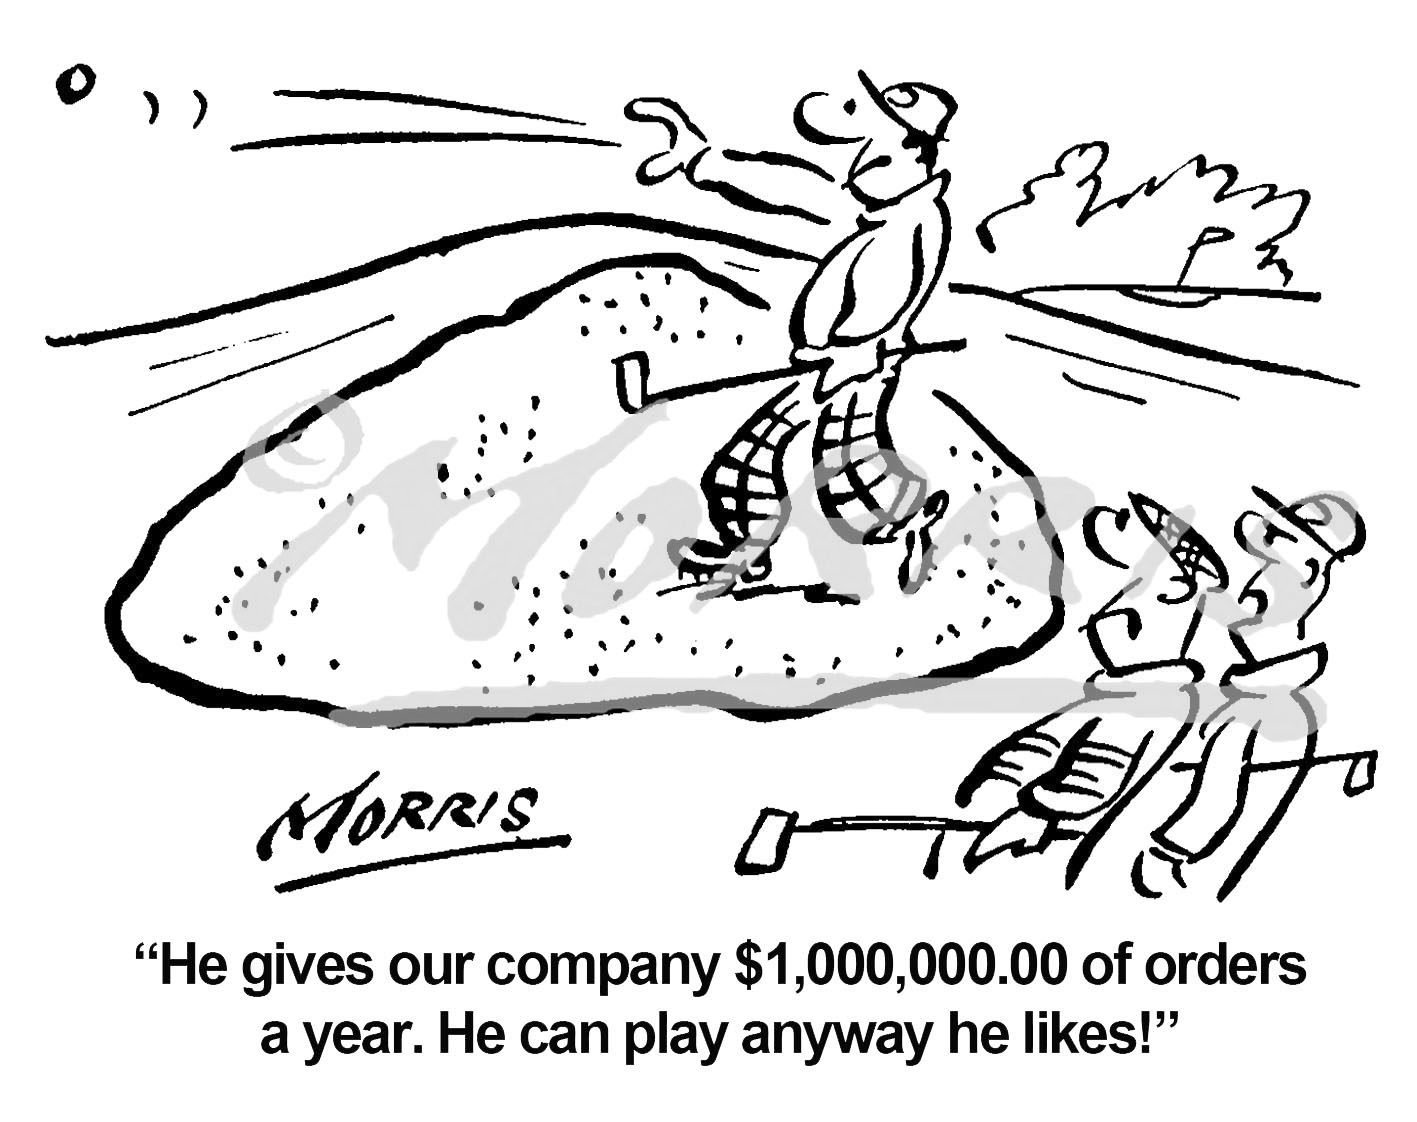 Sales Order golf cartoon Ref: 1280bwus